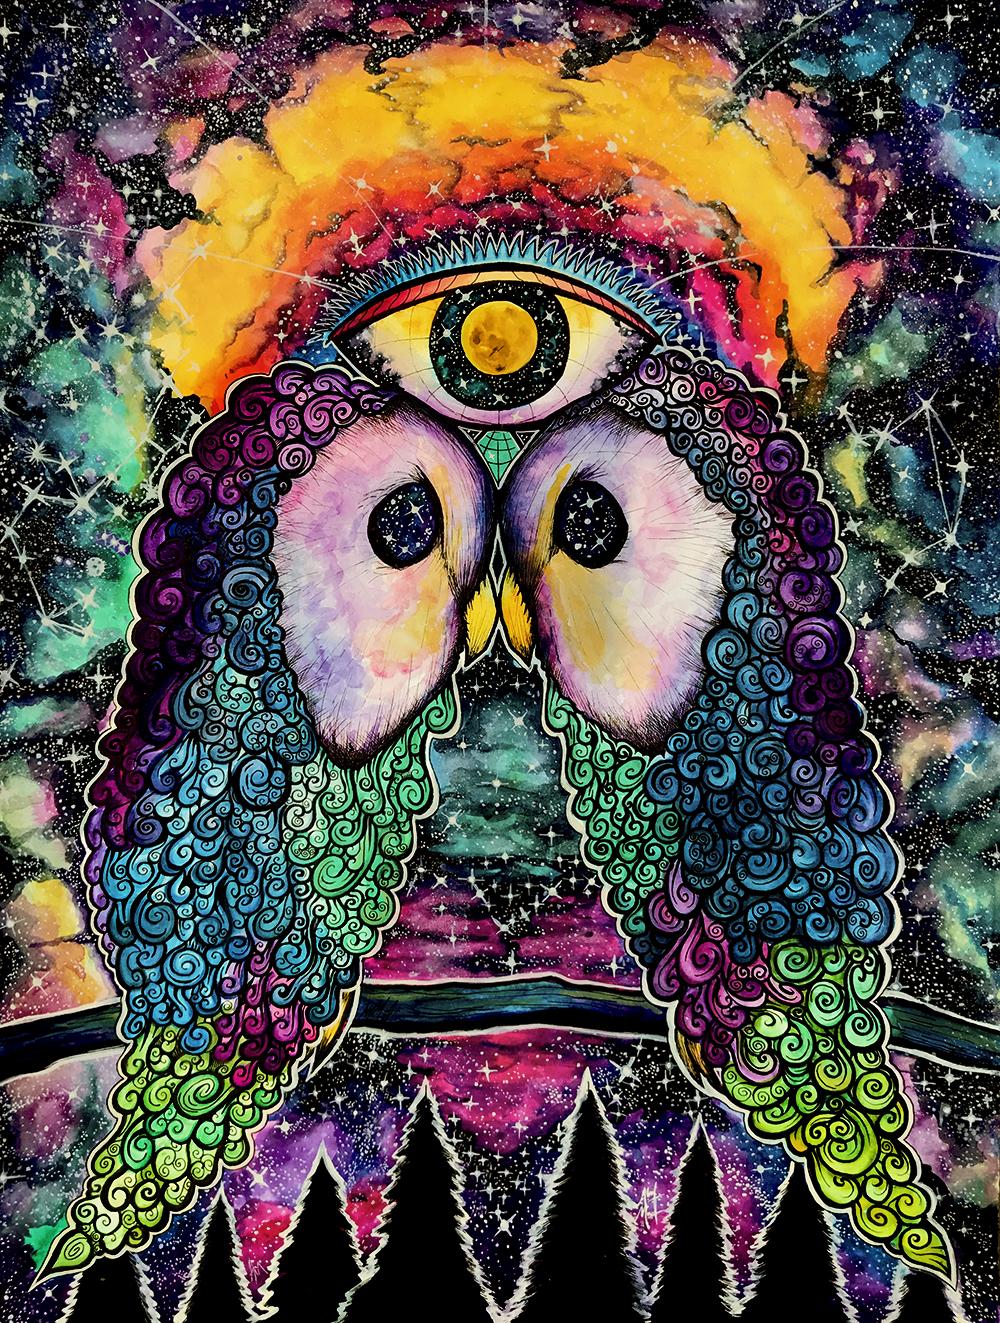 In Cosmic Unison